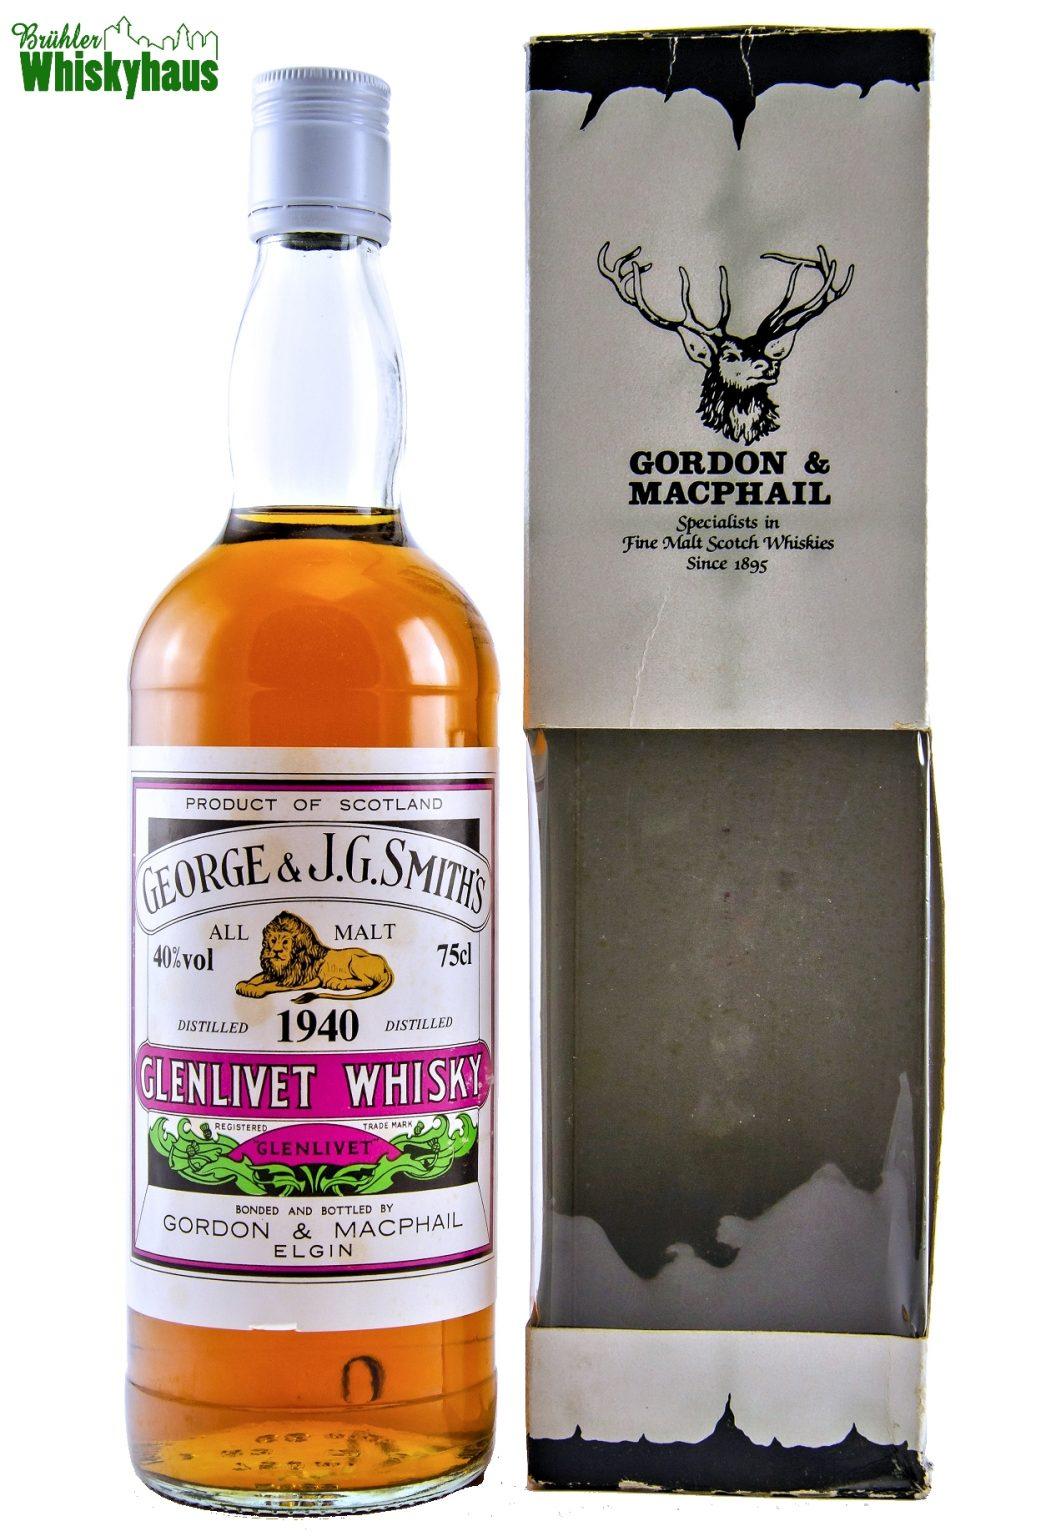 Glenlivet Vintage 1940 - George & J.G. Smith's - Rare Vintage Serie by Gordon & MacPhail - Single Malt Scotch Whisky